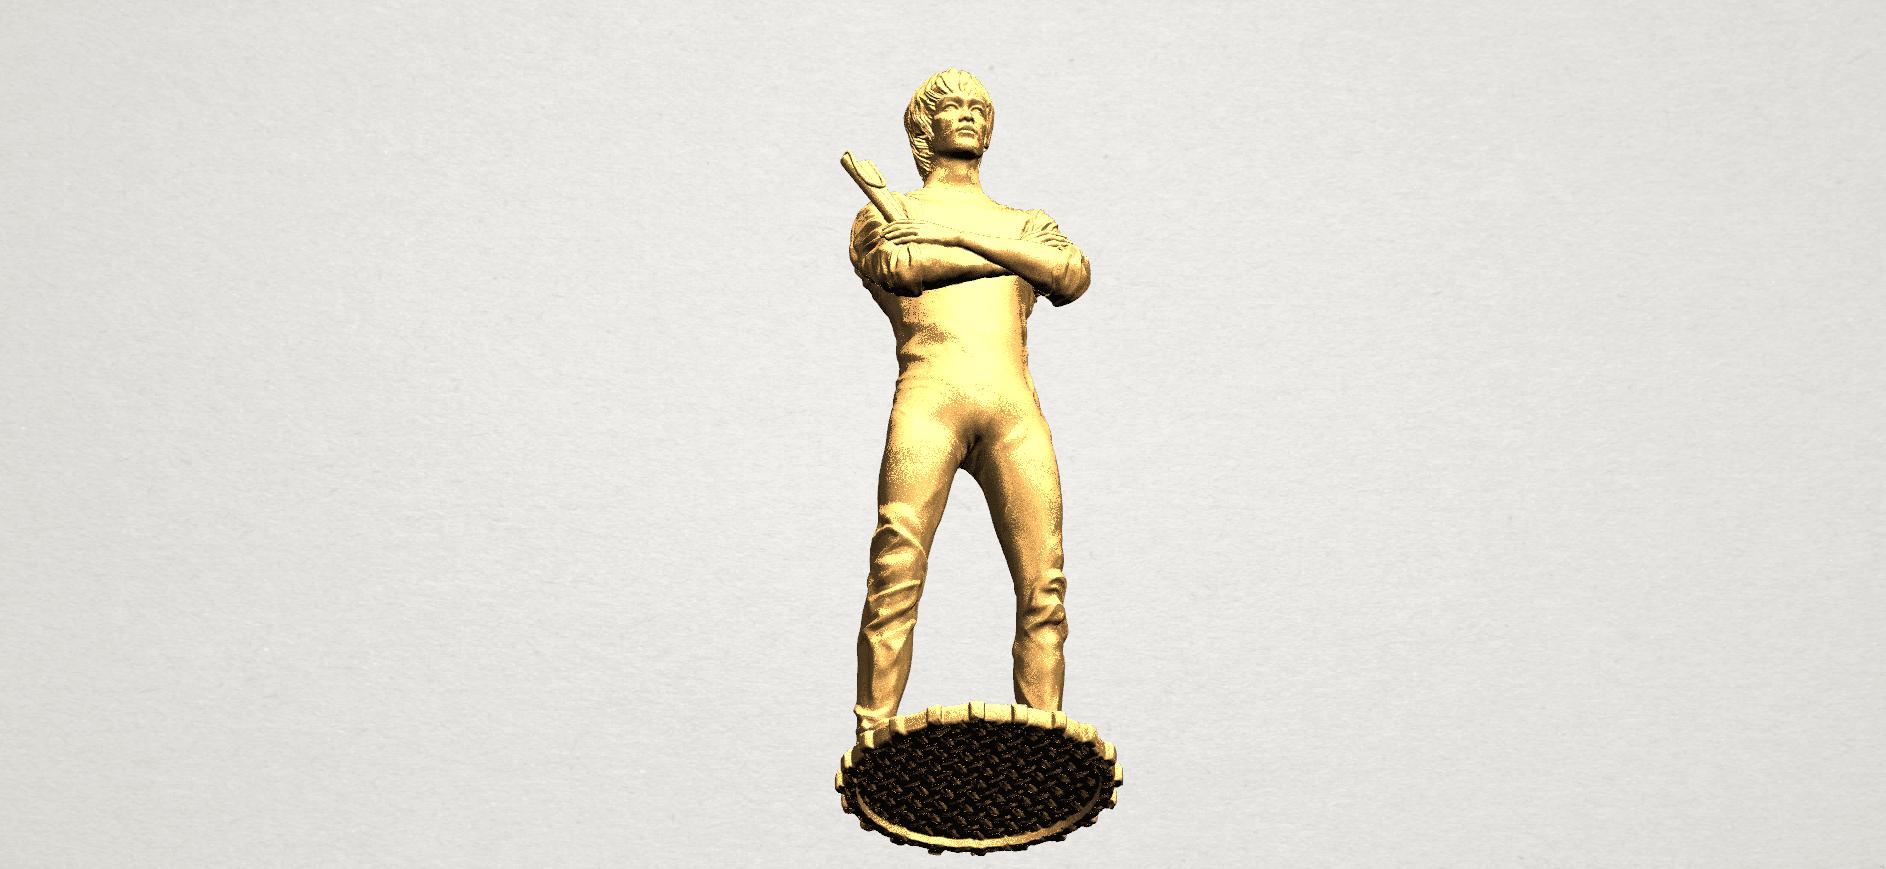 Bruce Lee A10.png Download free STL file Bruce Lee • 3D printing design, GeorgesNikkei